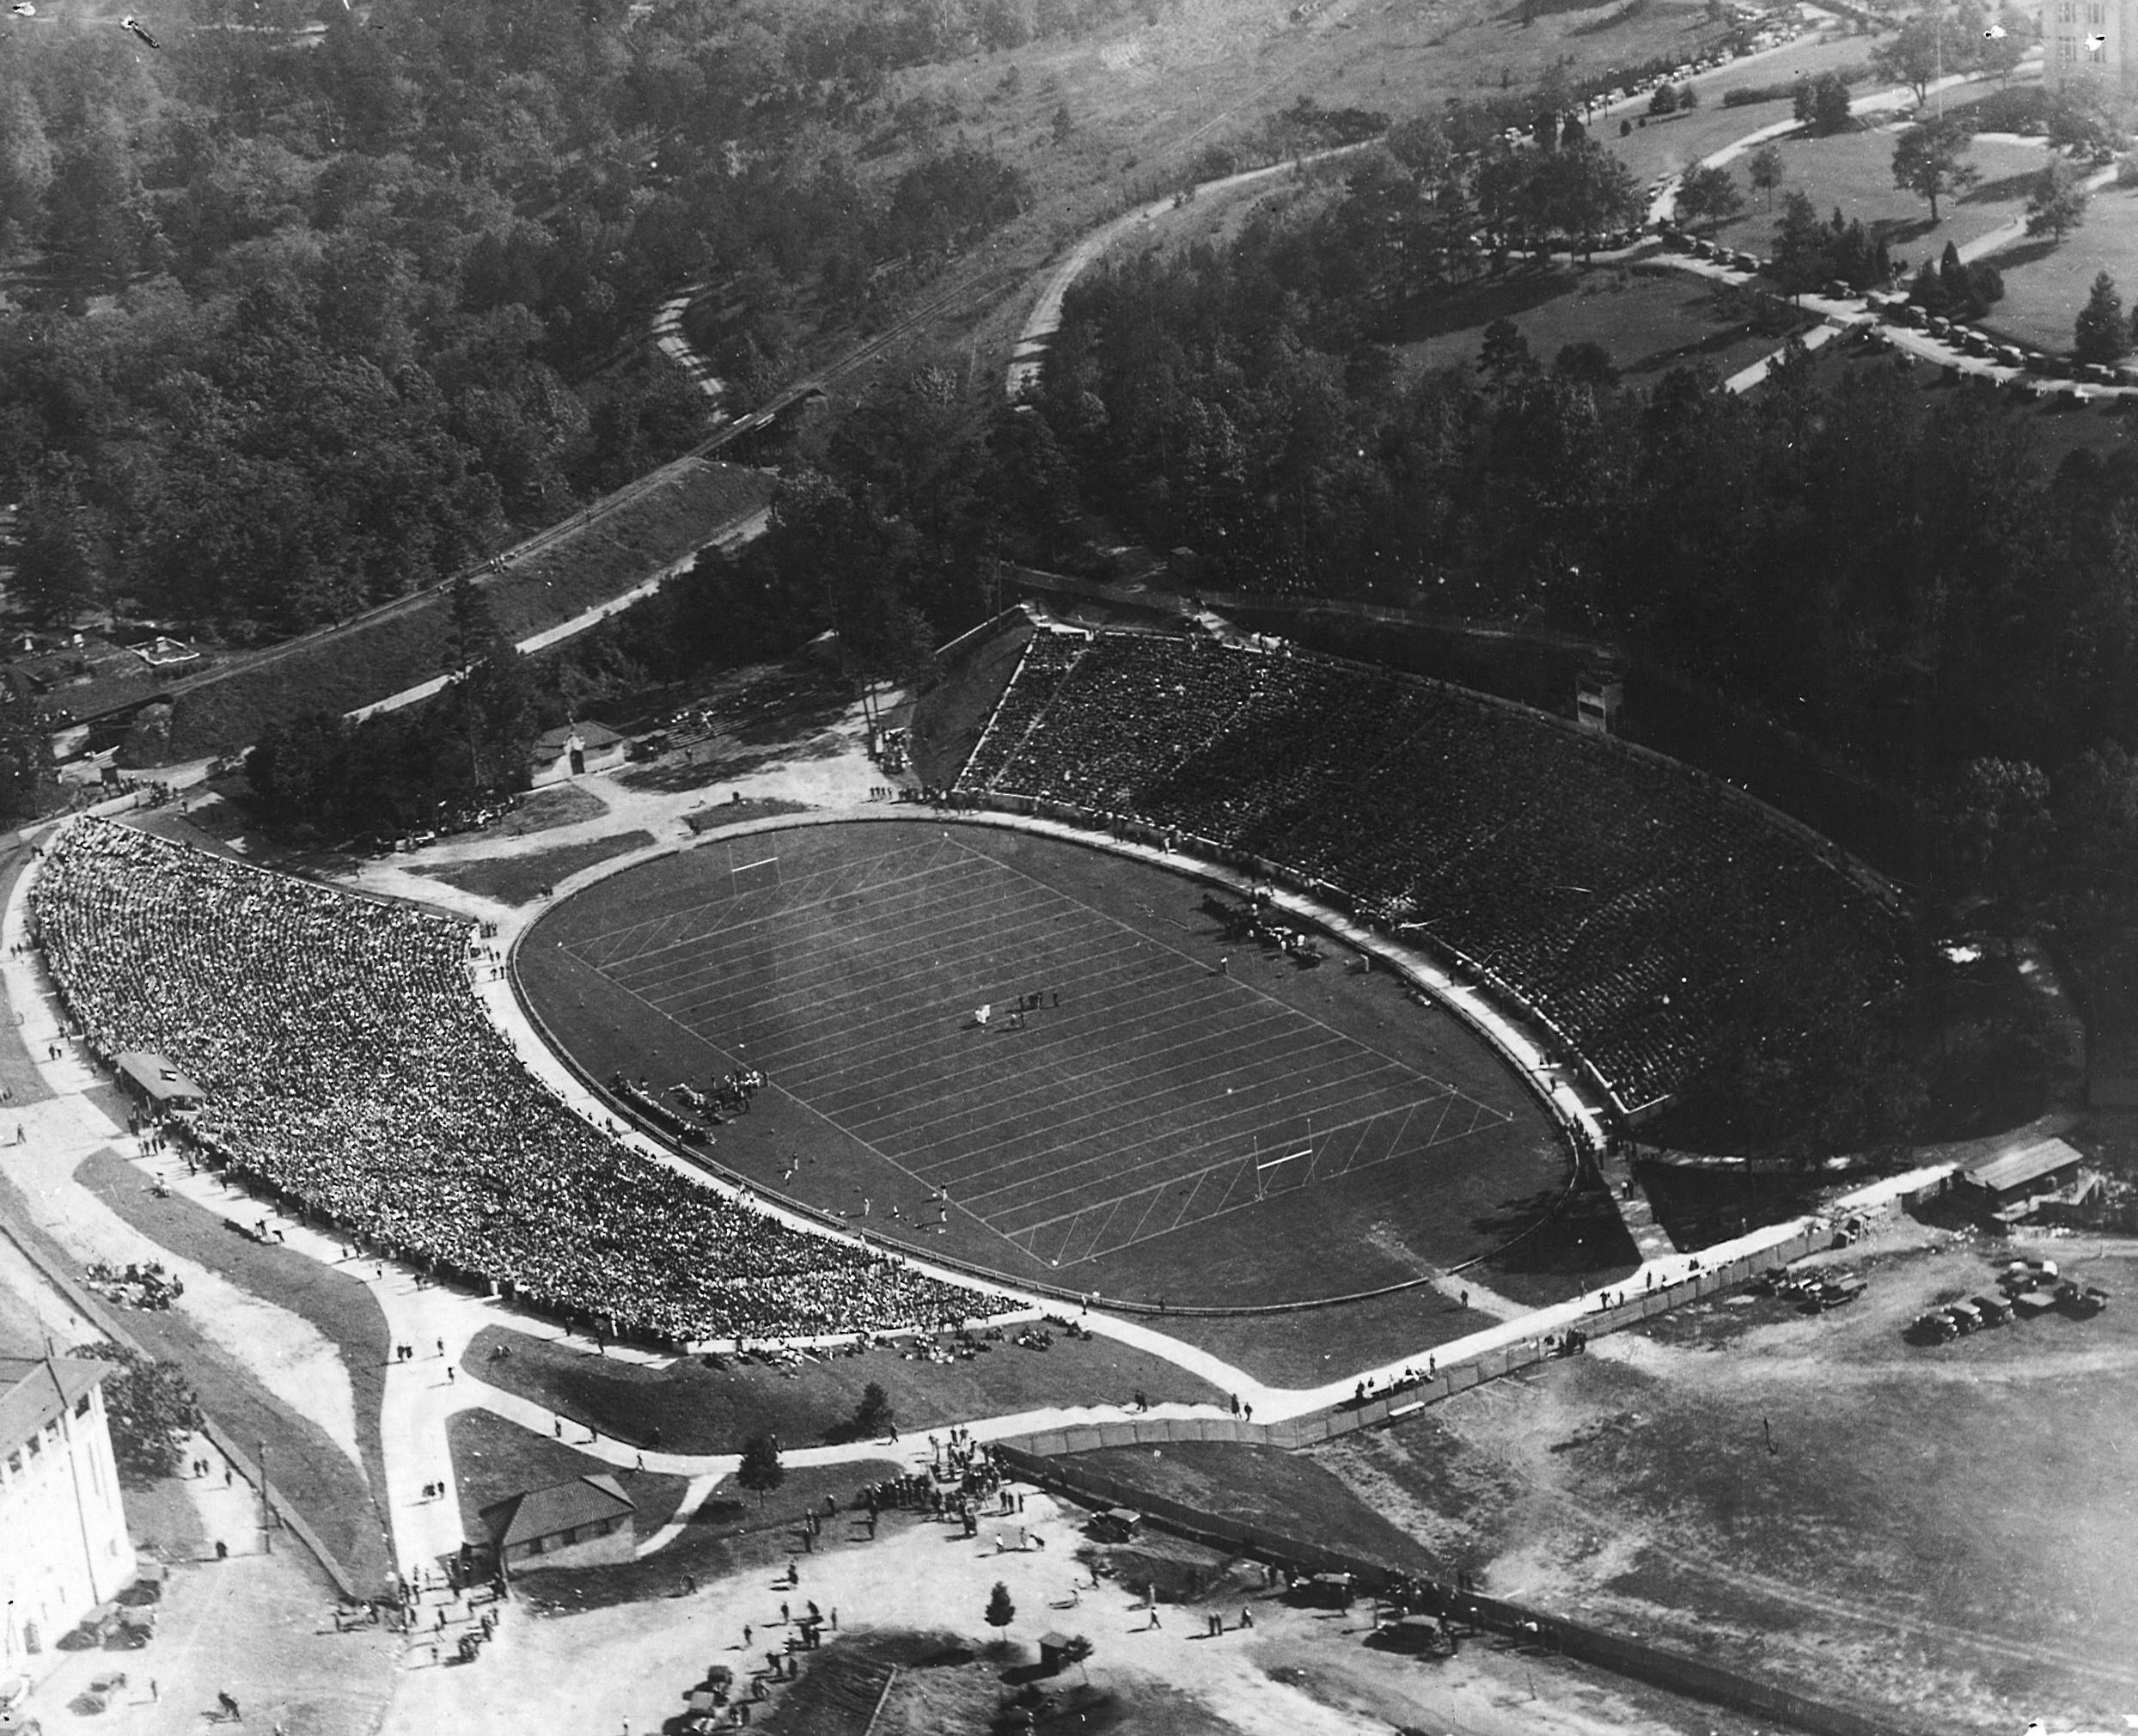 University Of Georgia Bulldogs Football